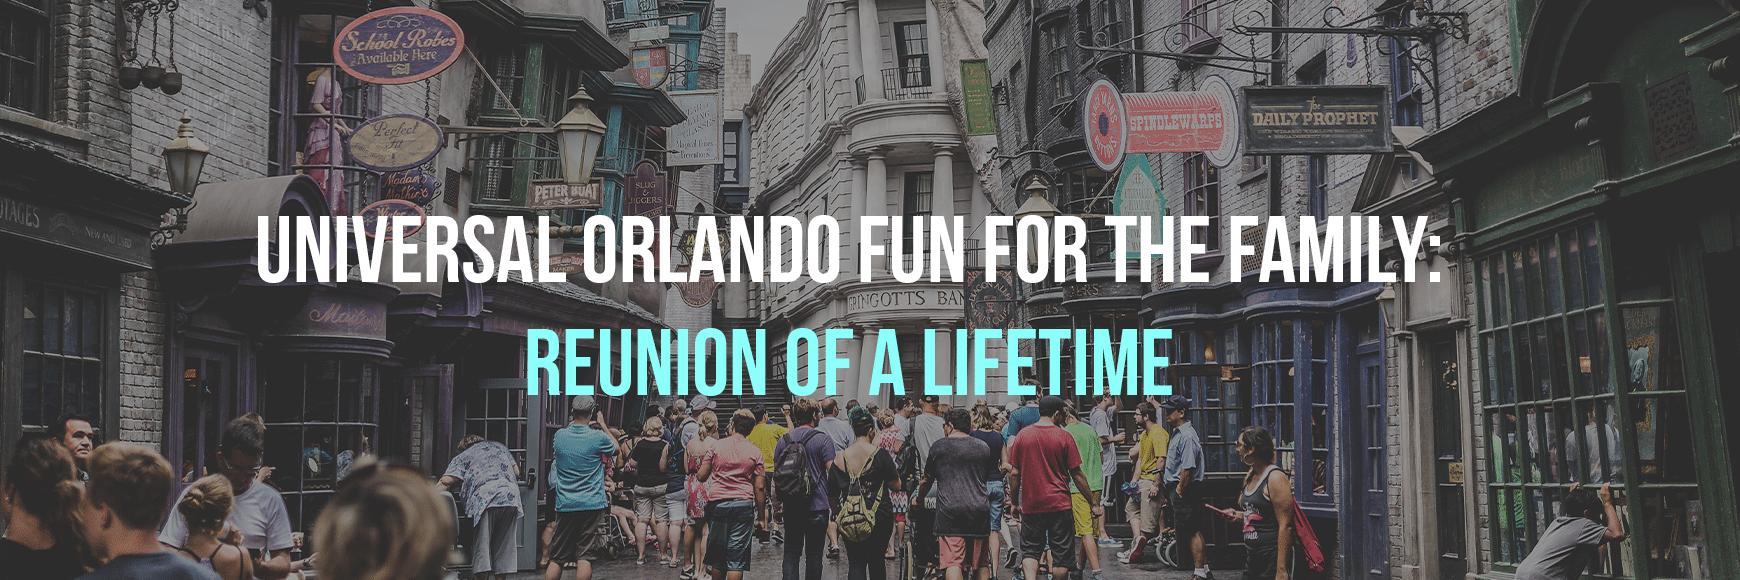 Universal Reunion - Universal Orlando